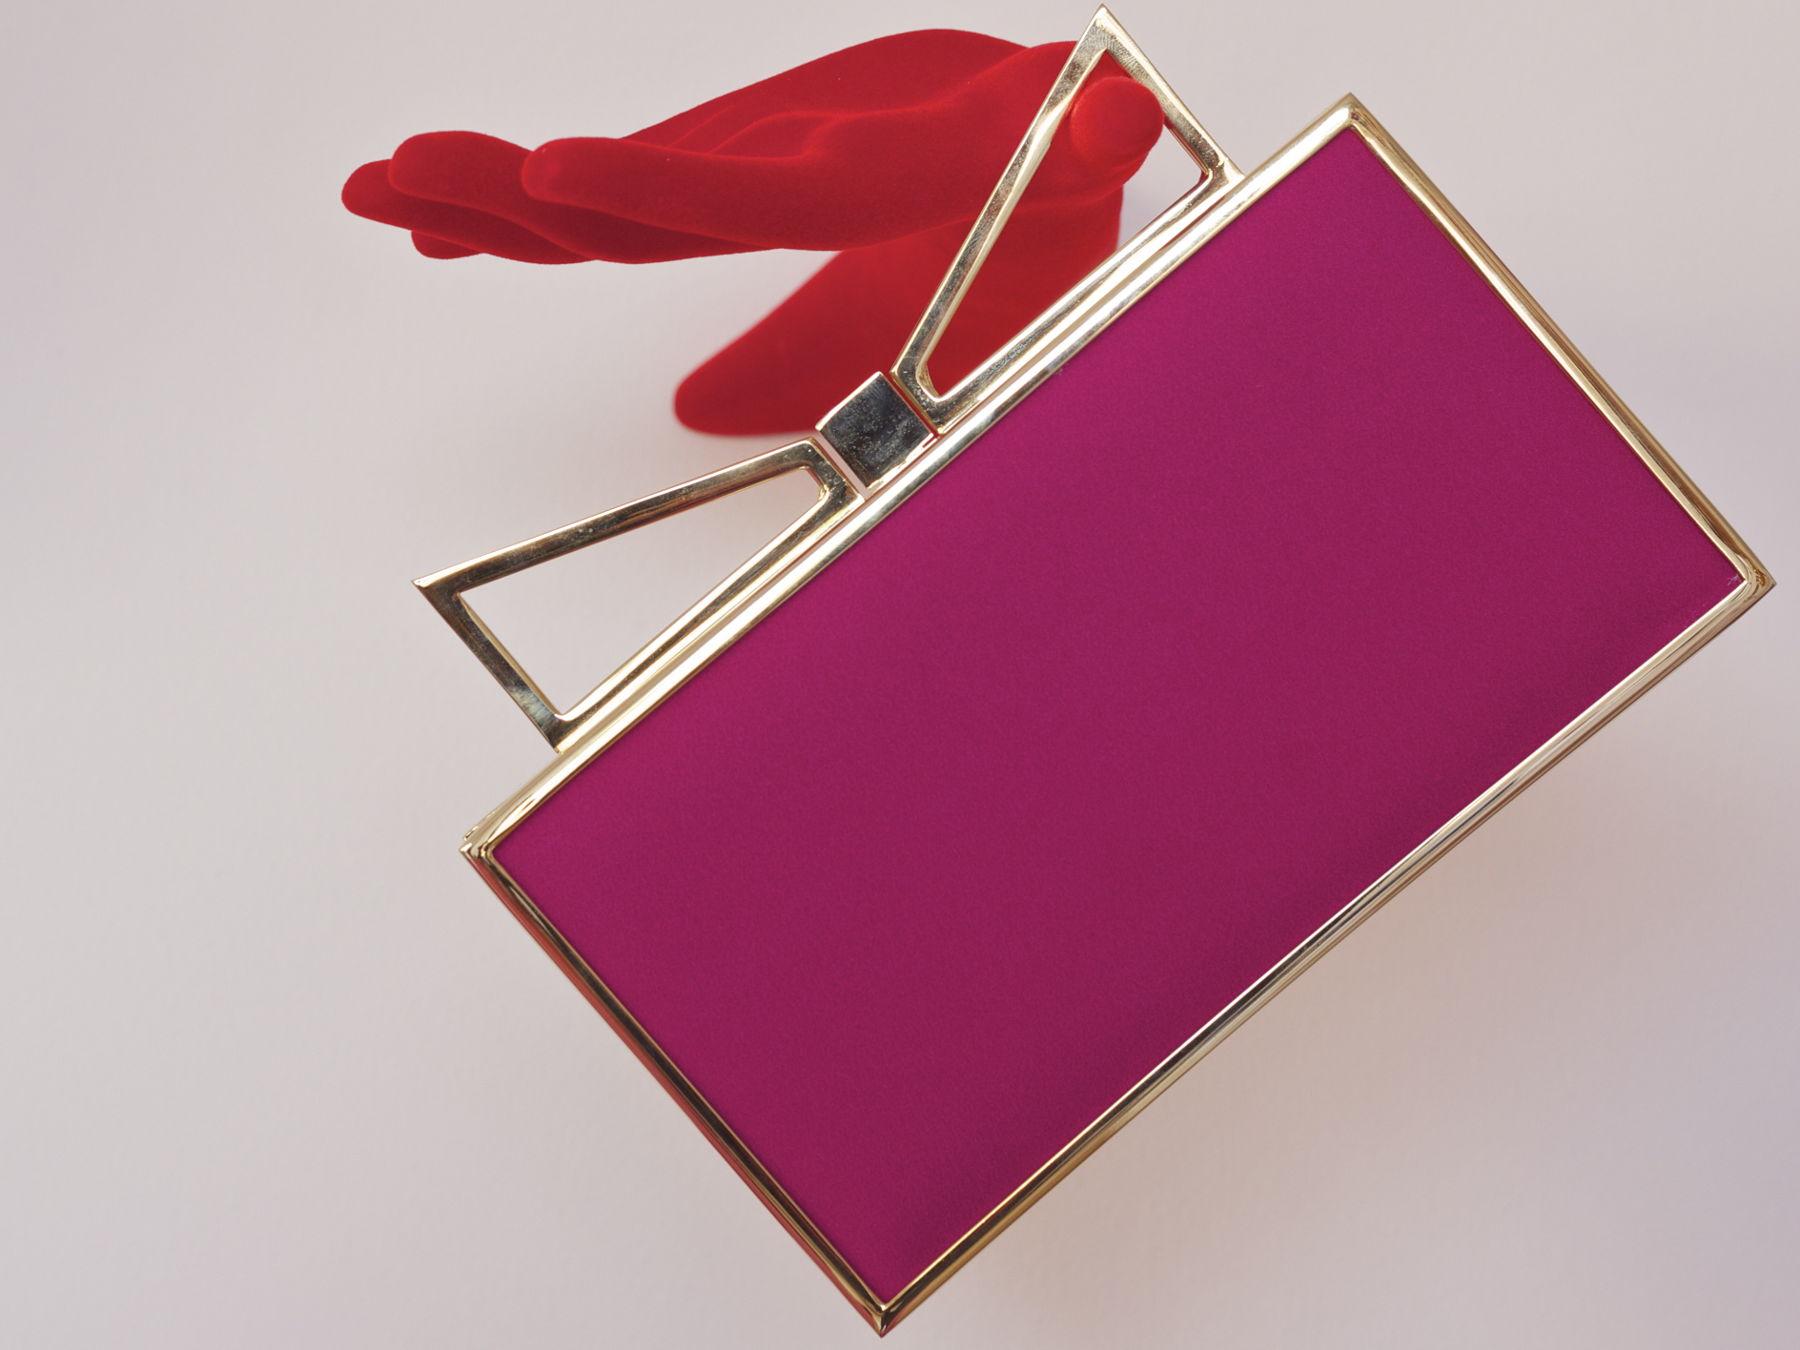 Handbag Sara Battaglia Trends 2014 Woman